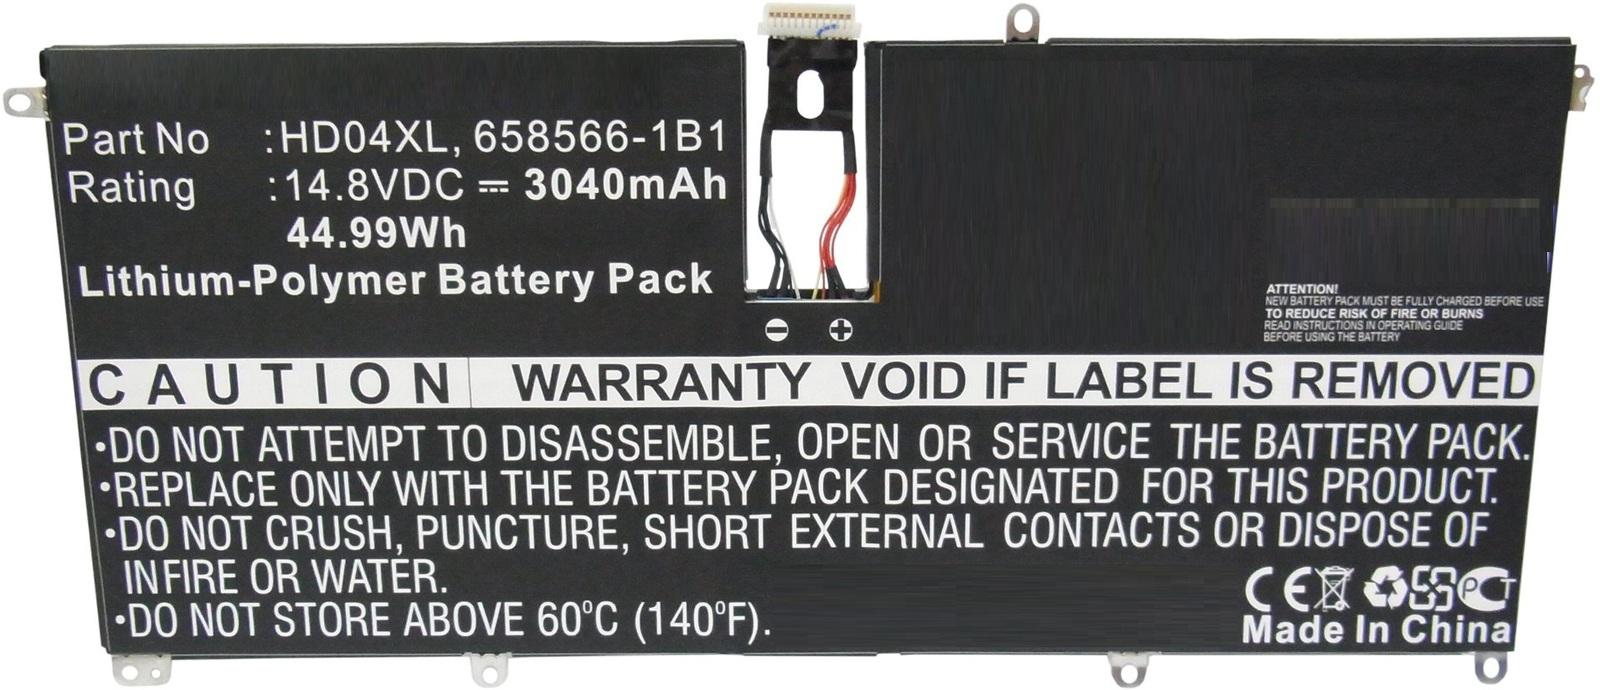 MicroBattery Laptop Battery for HP 44.99Wh Li-Pol 14.8V 3040mAh MBXHP-BA0151 - eet01